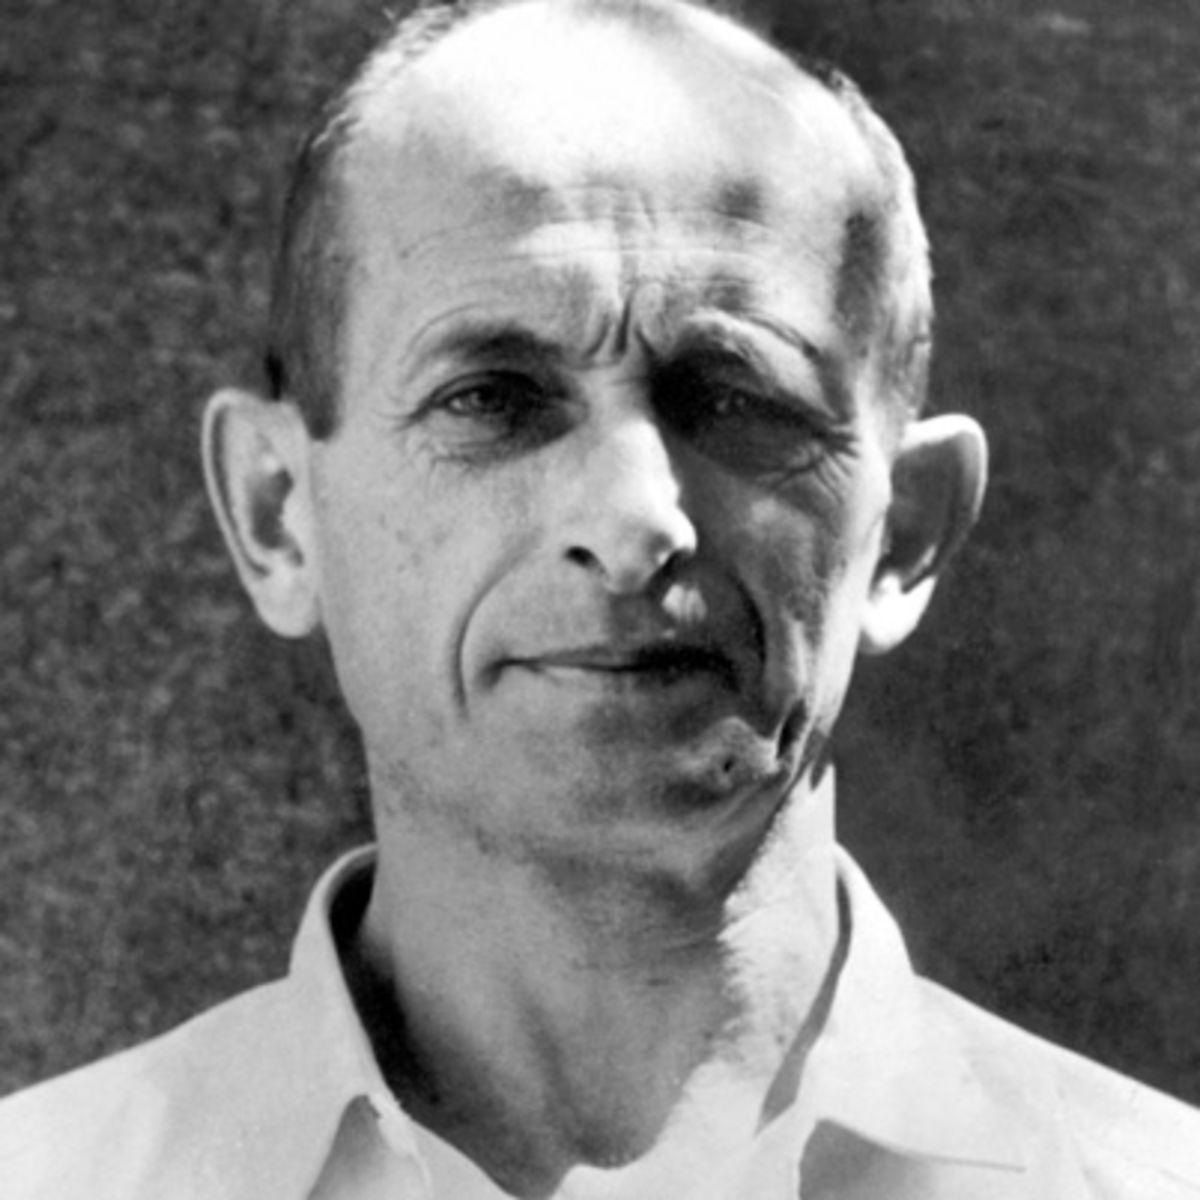 Biography Learn More About German Bureaucrat Adolf Eichmann